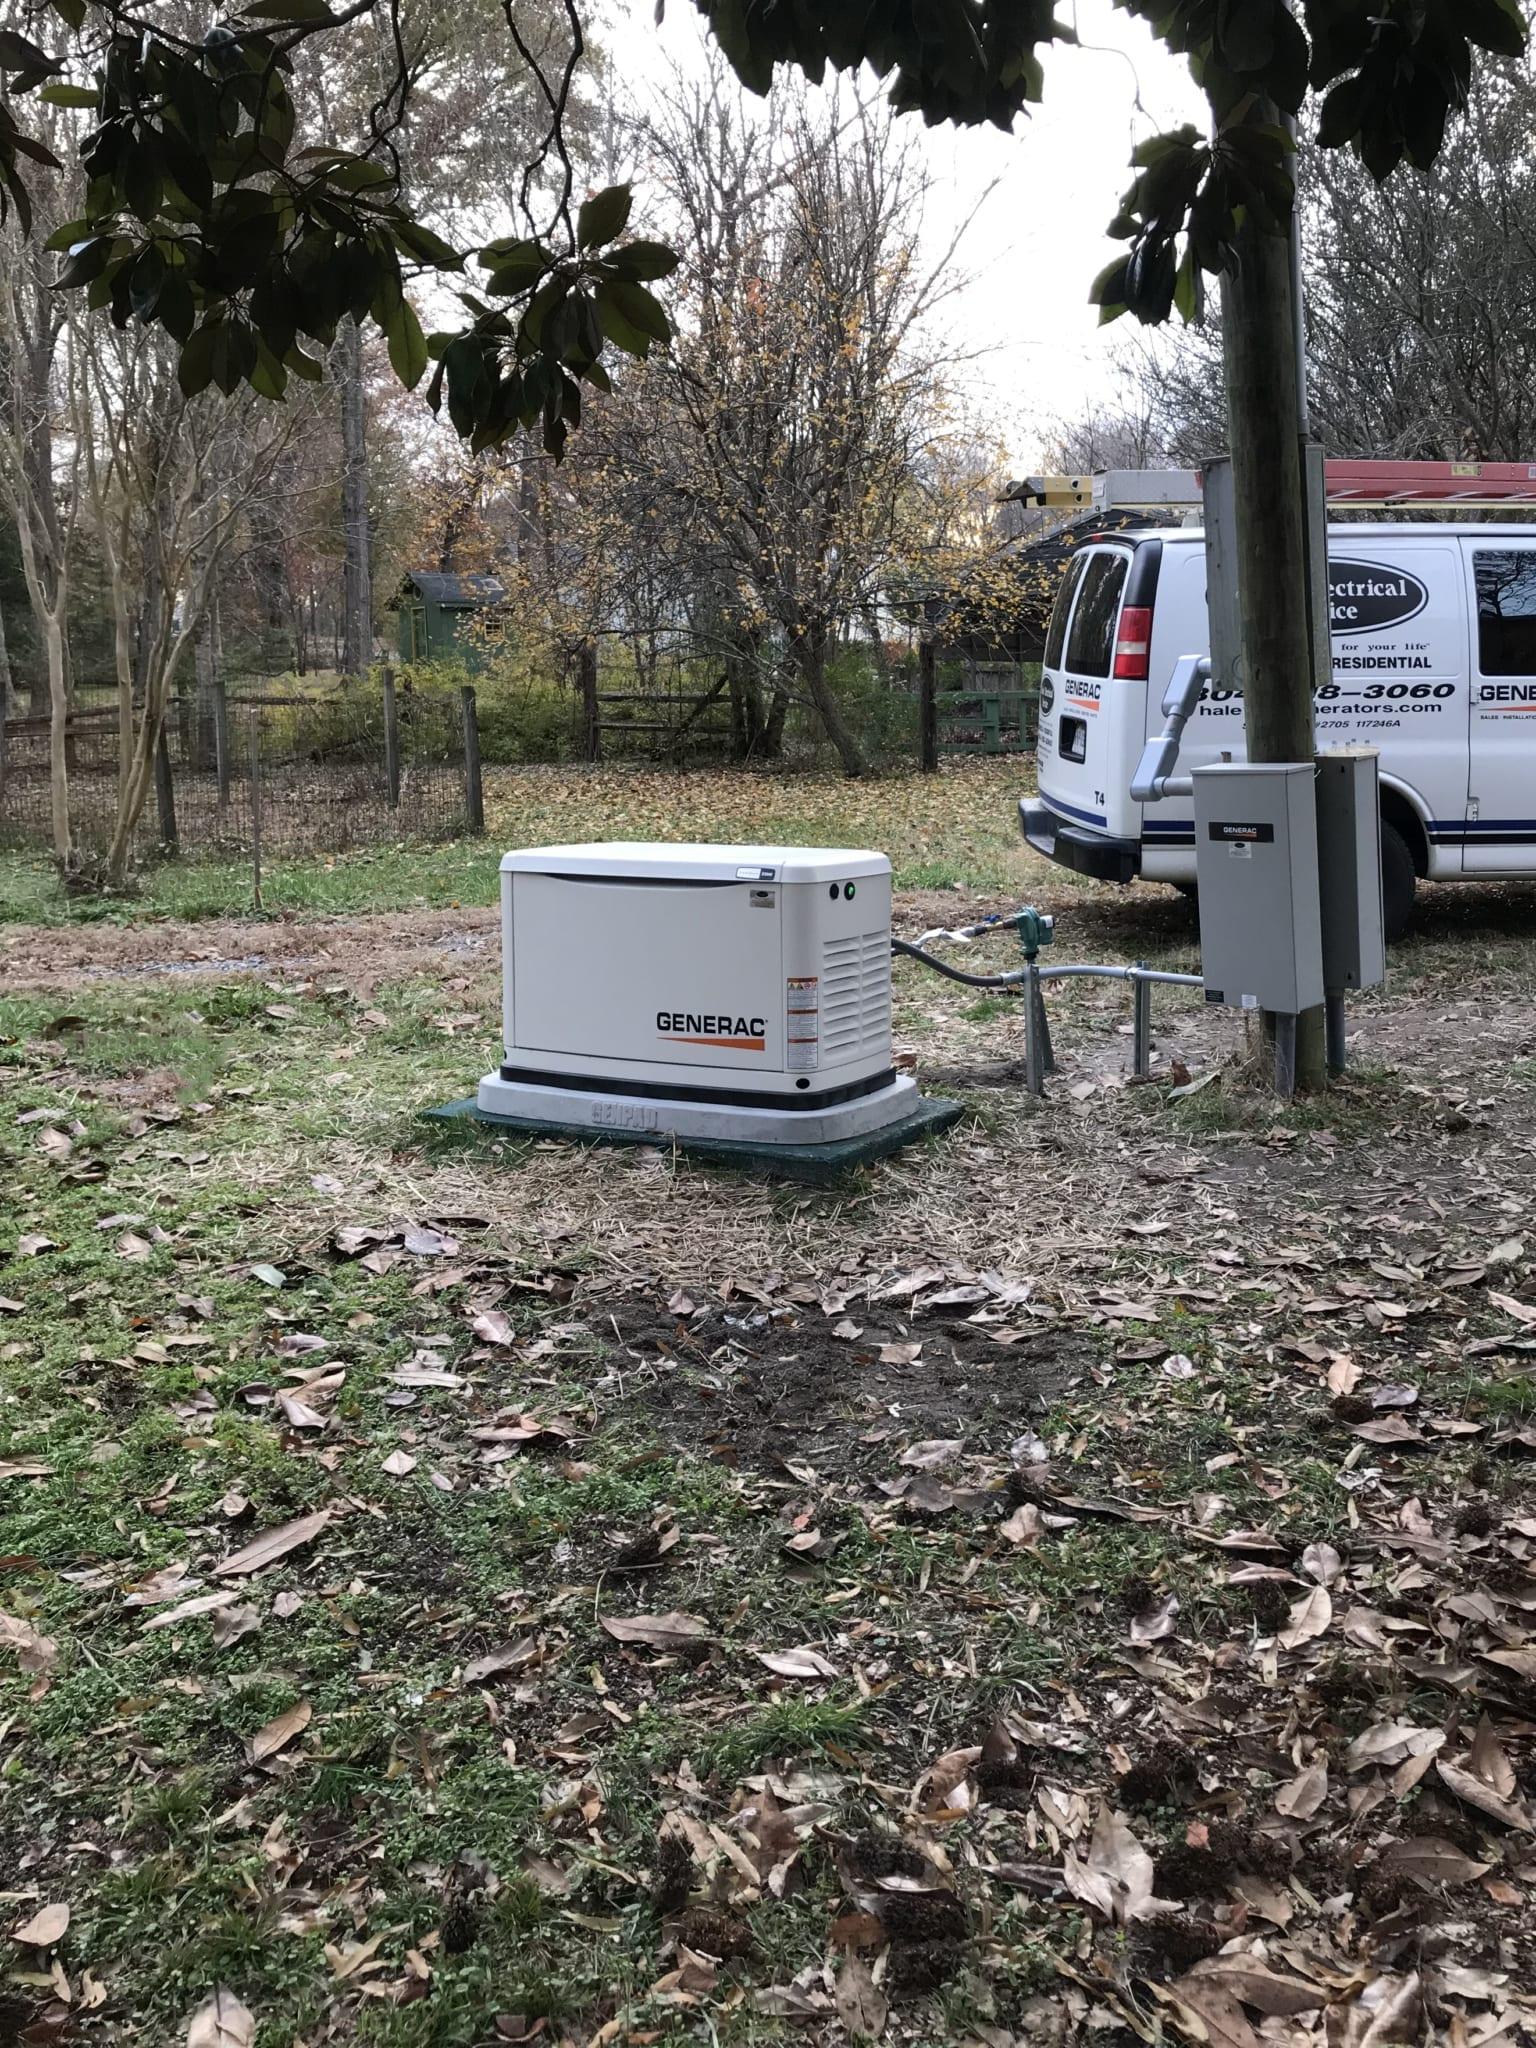 11.26.19 Nottoway Generac Automatic Standby Generator Far